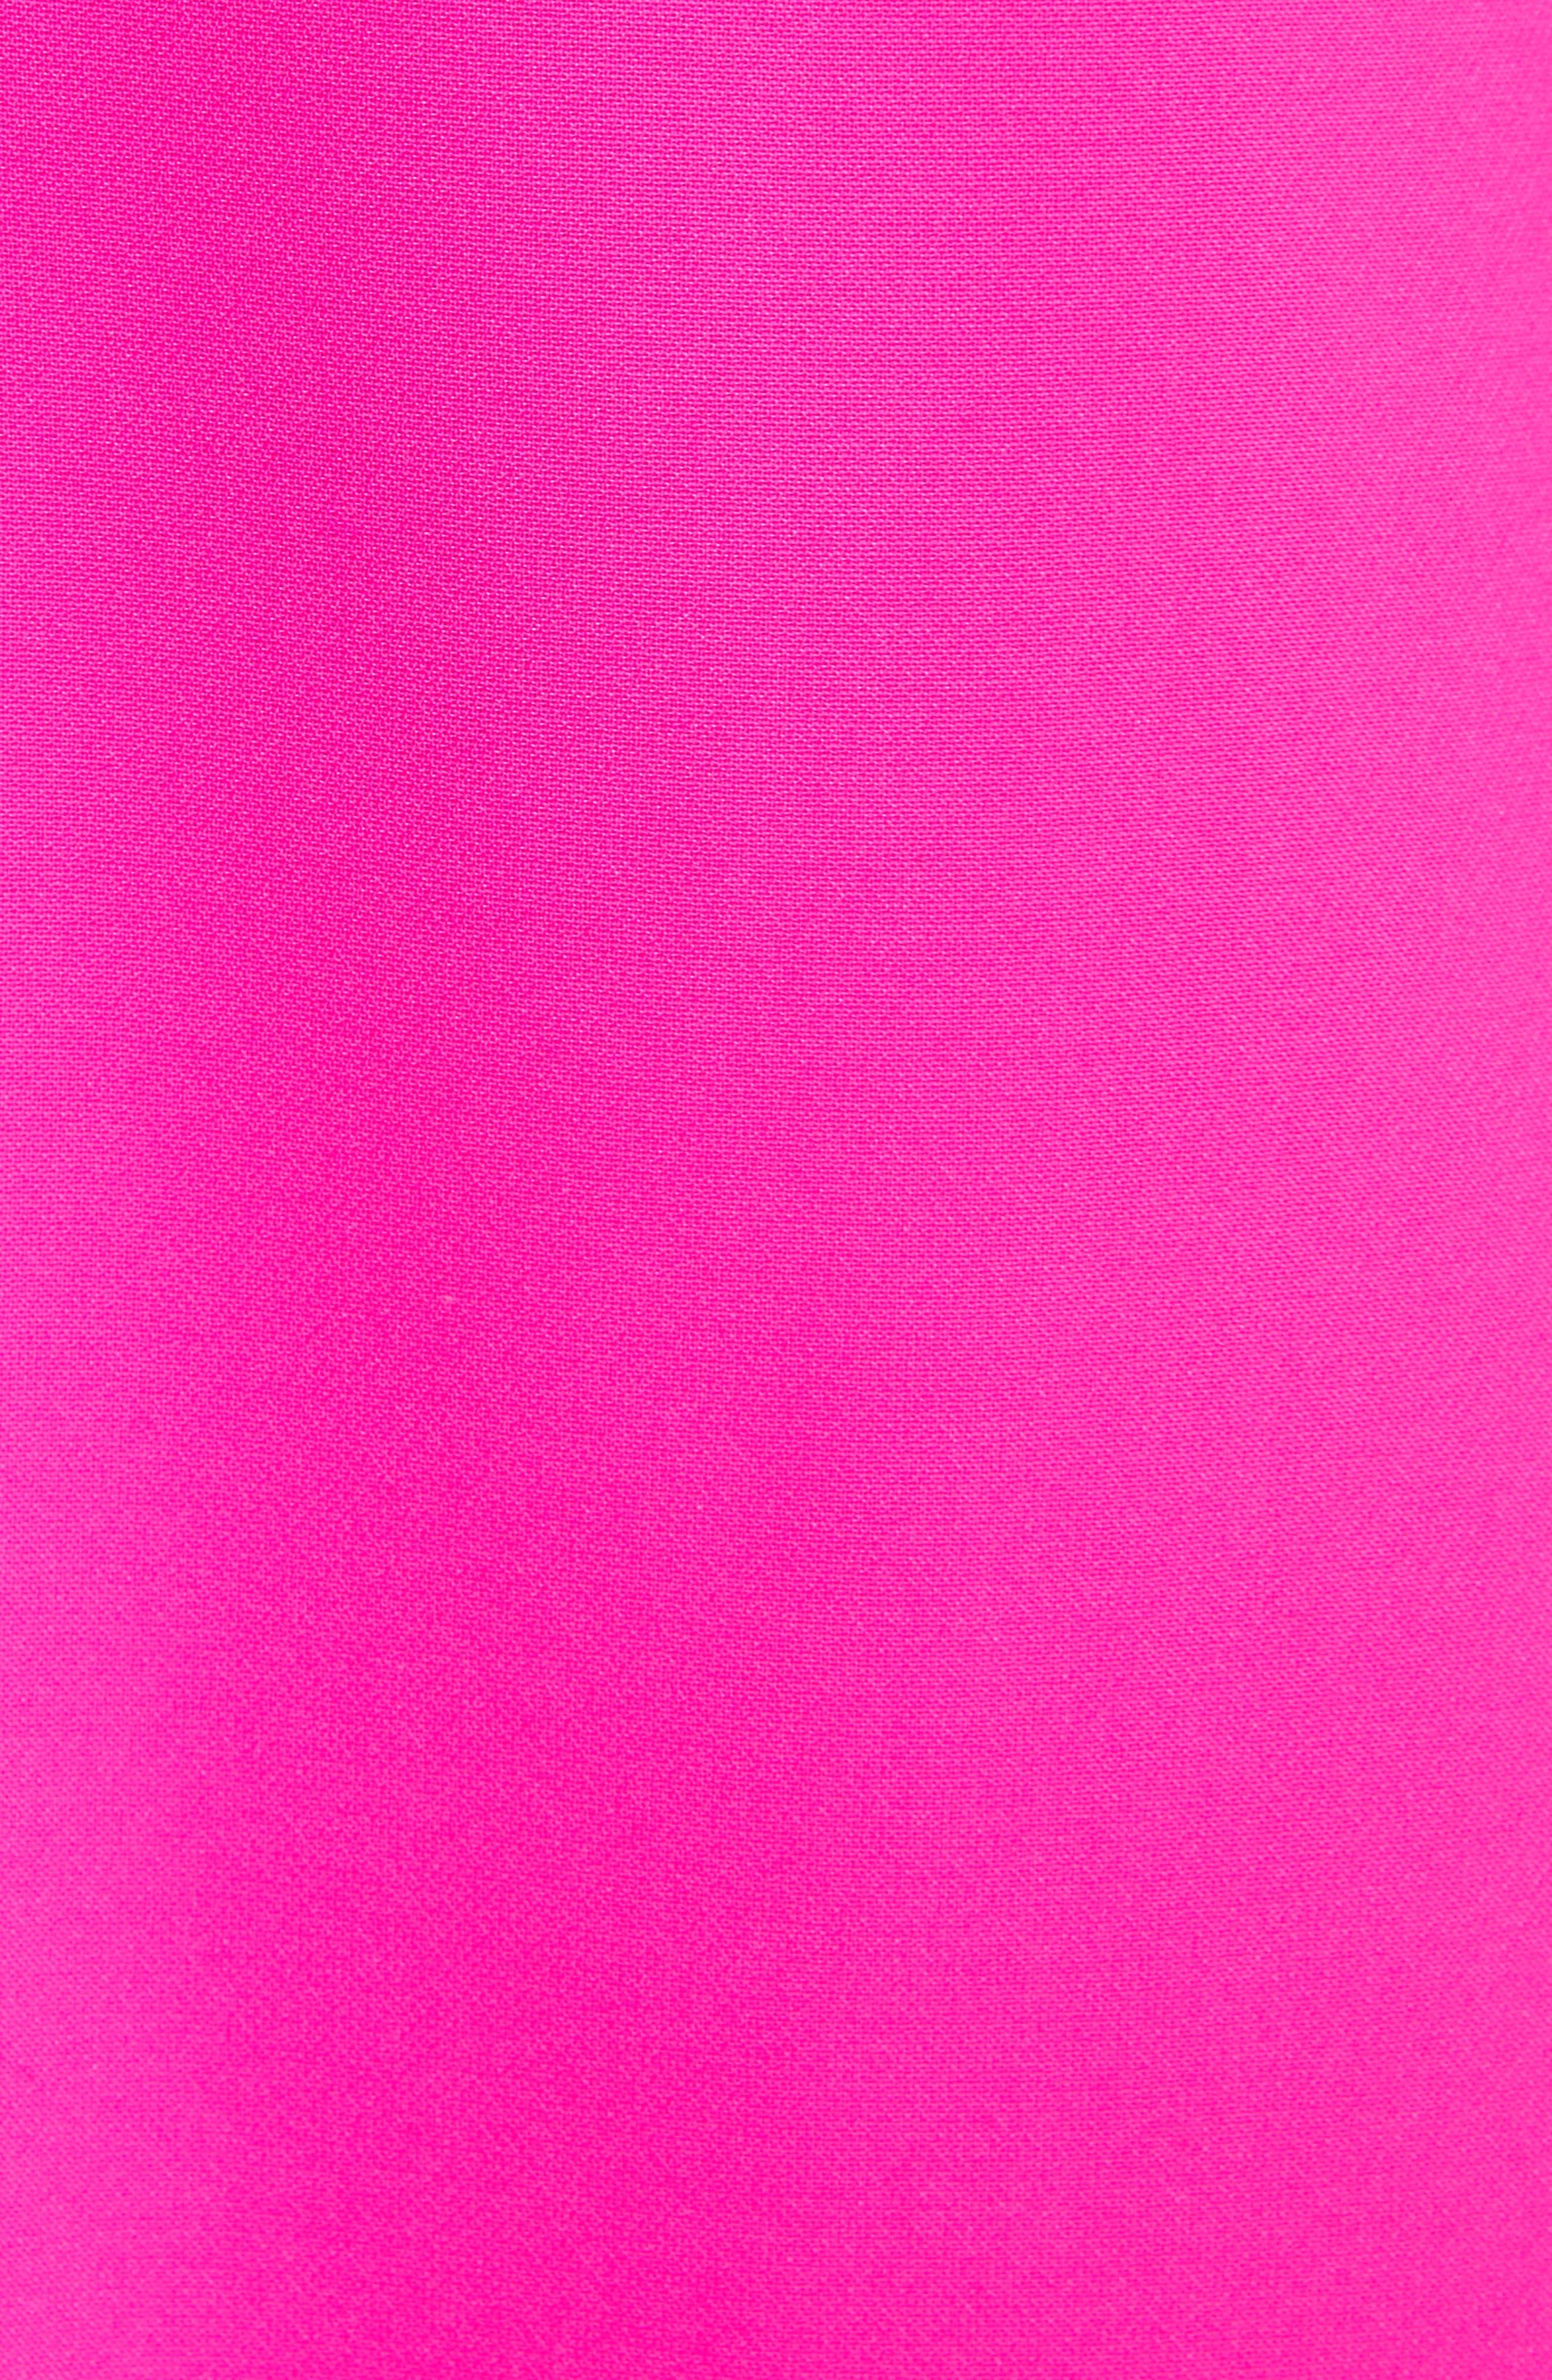 Torrii High Neck Tunic Dress,                             Alternate thumbnail 5, color,                             Bright Pink